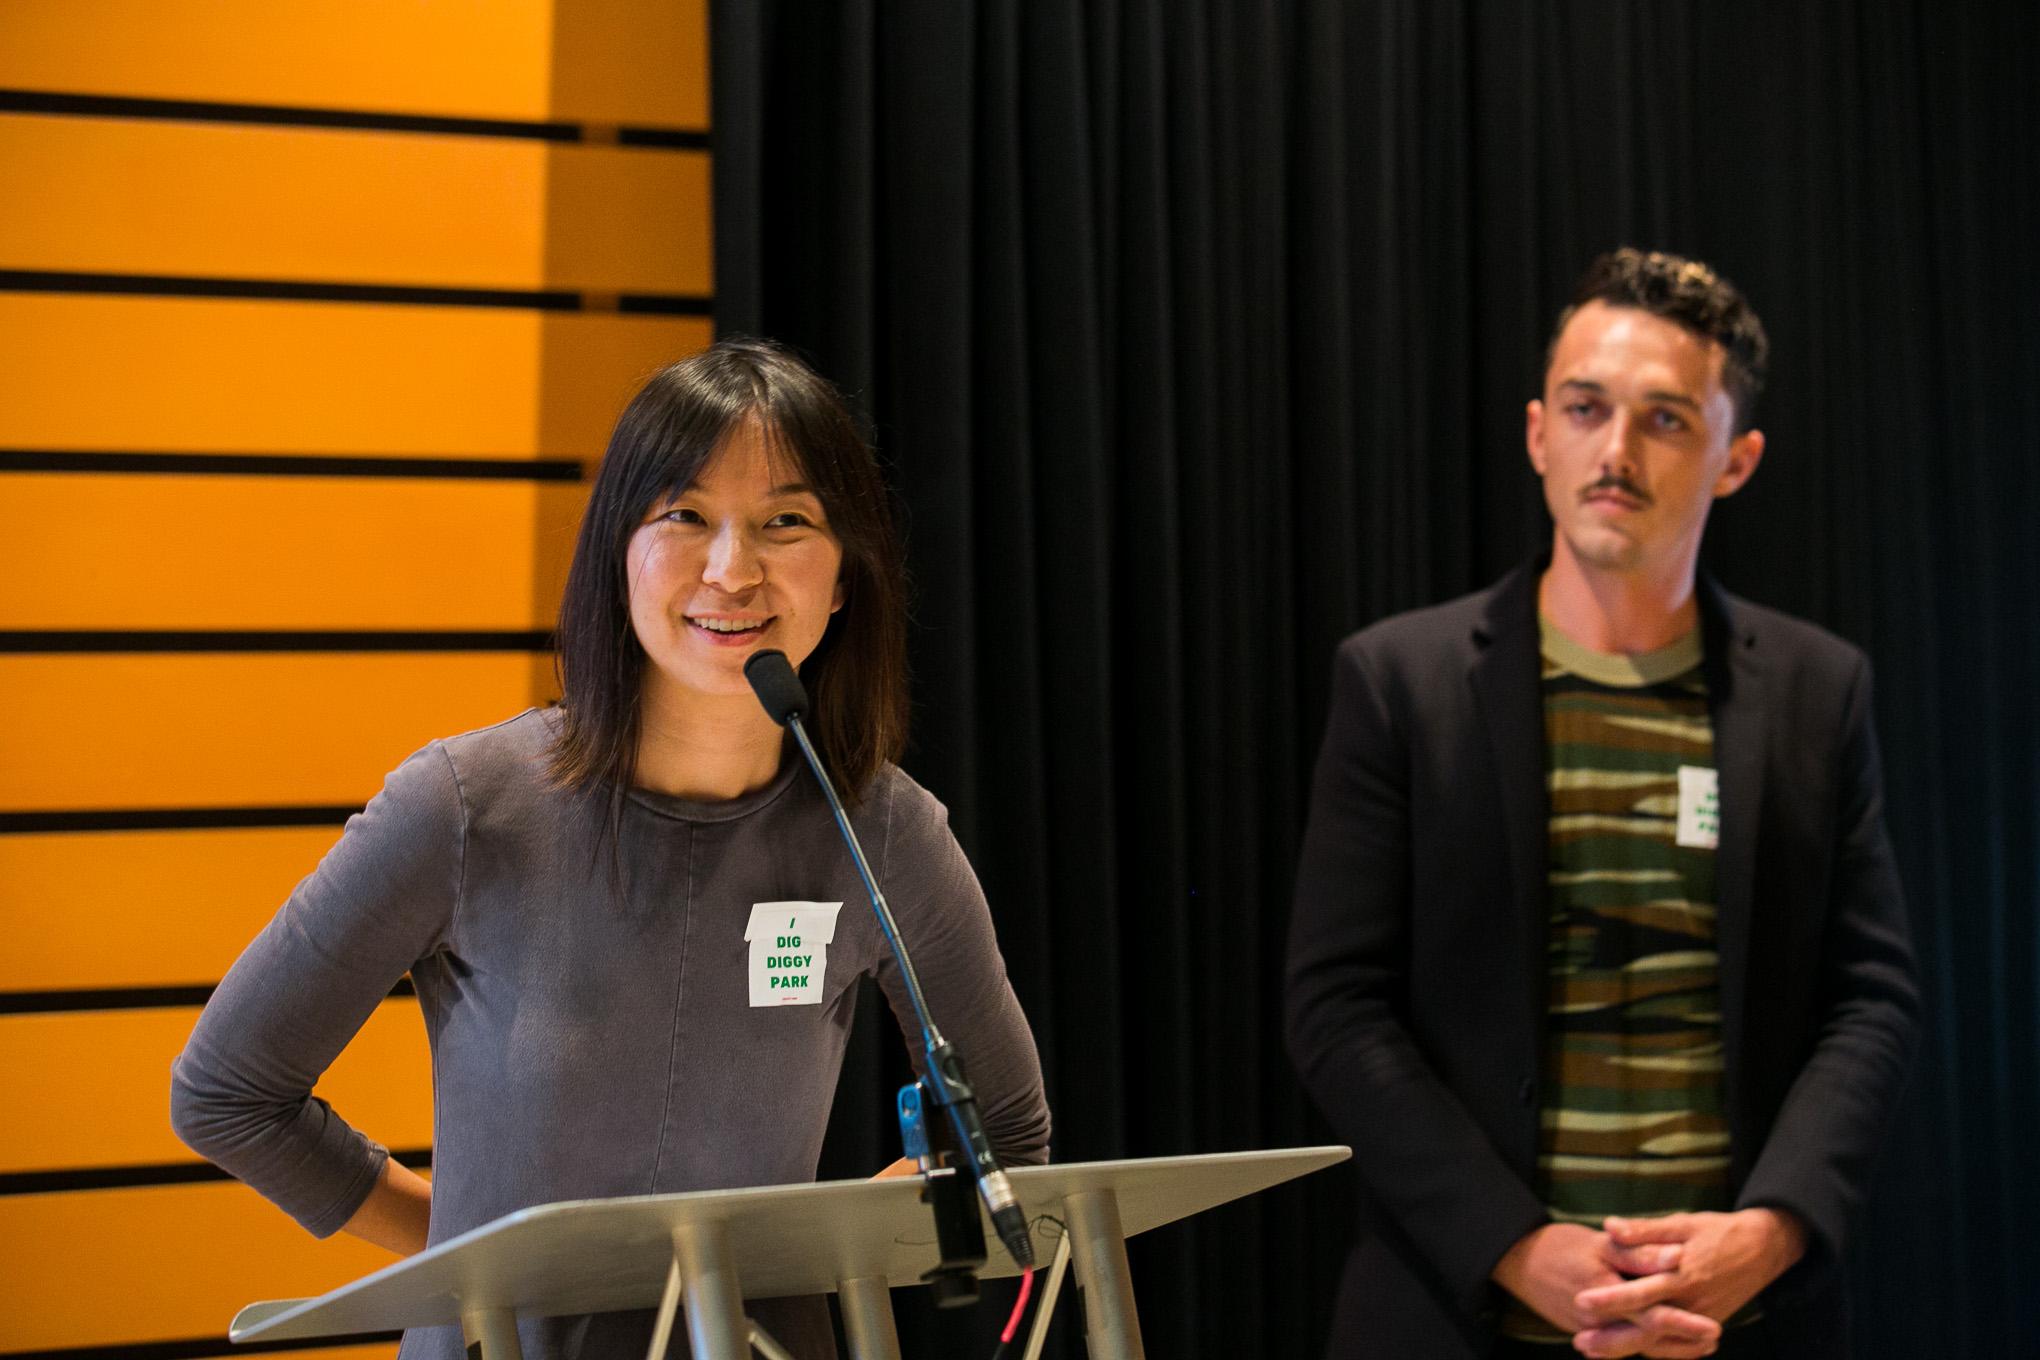 Allison Hu and Nicolas Rivard speak about their non-profit Public Space East. Photo by Kathryn Boyd-Batstone.